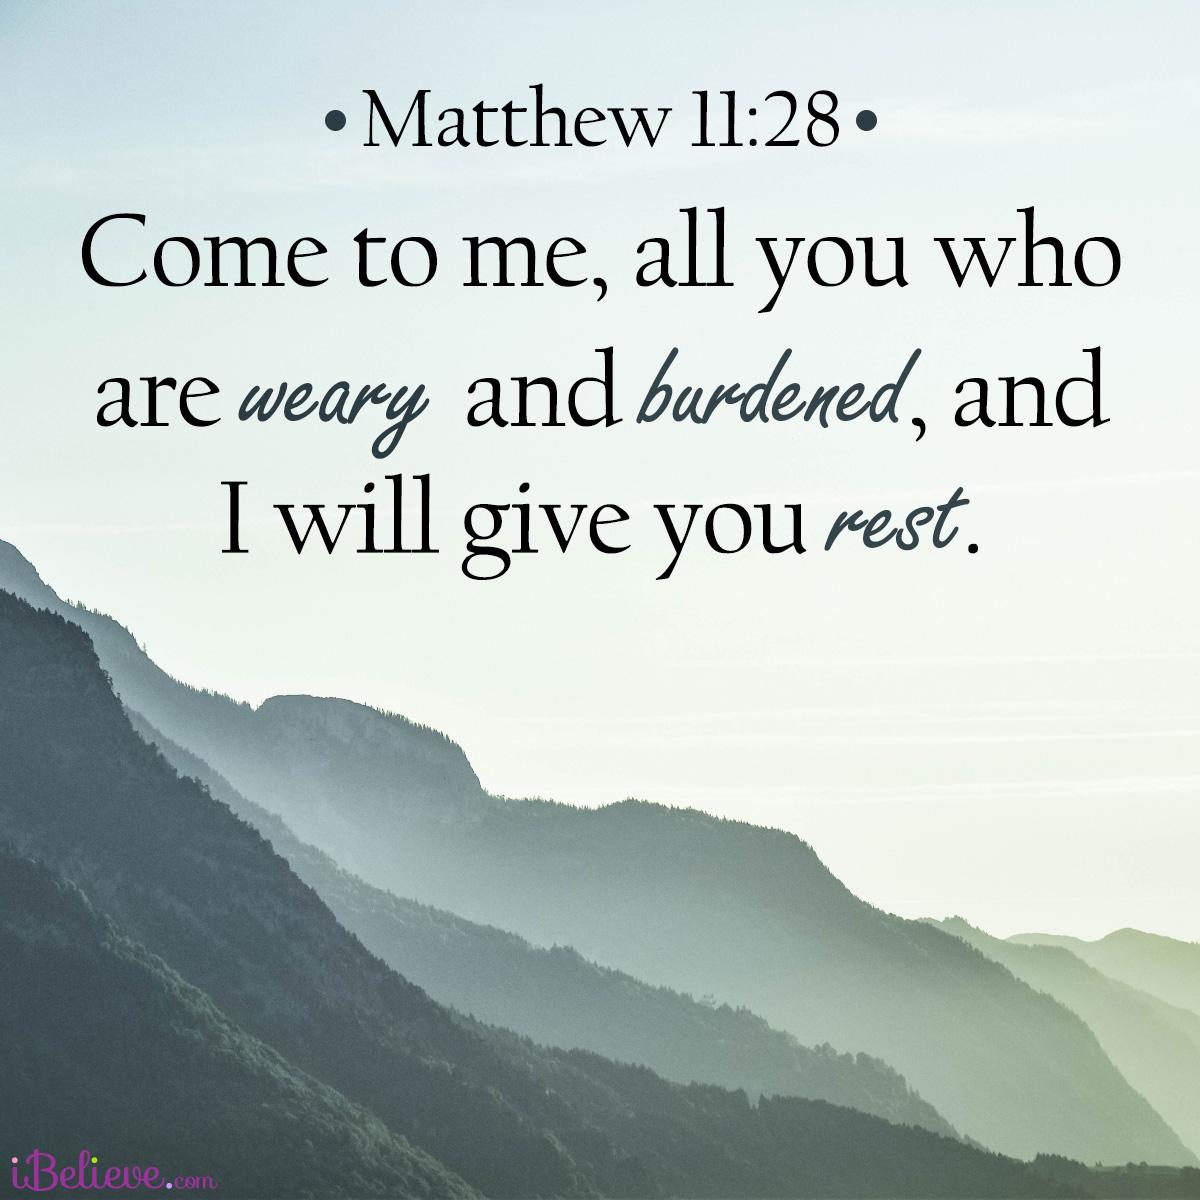 Matthew 11:28, inspirational image